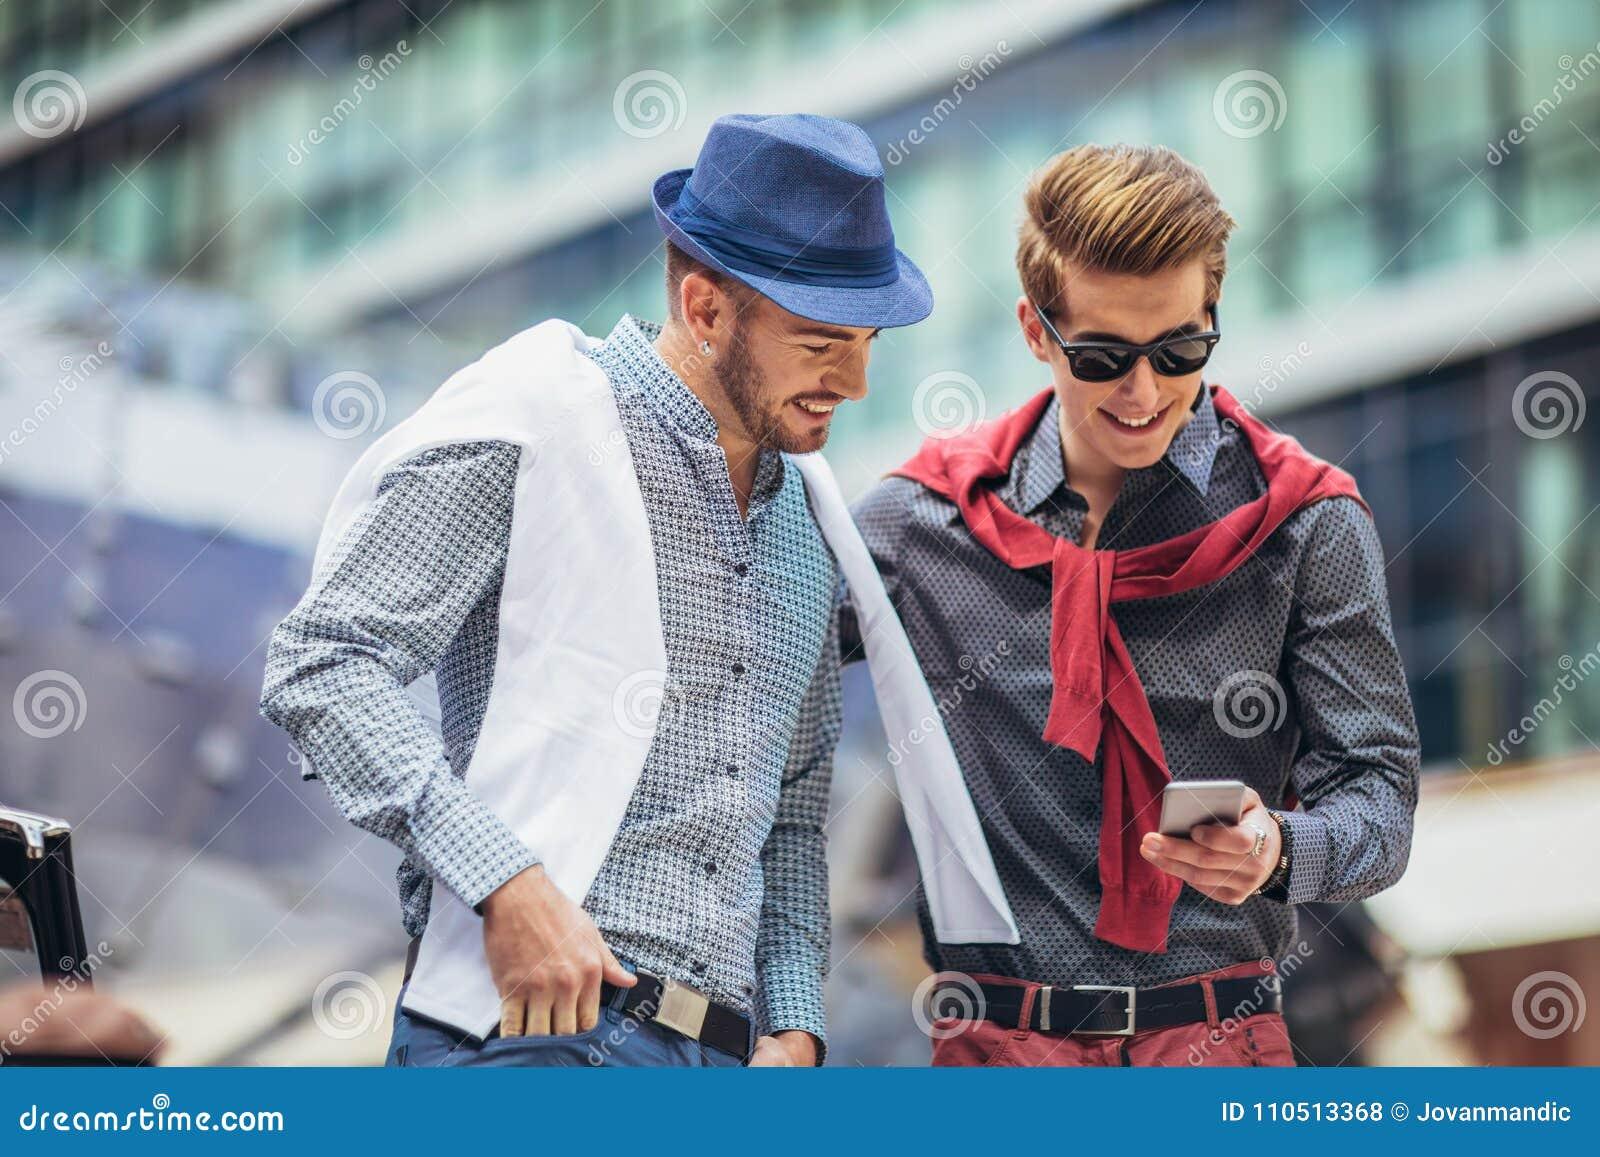 Beautiful models outdoors using phone, city style fashion